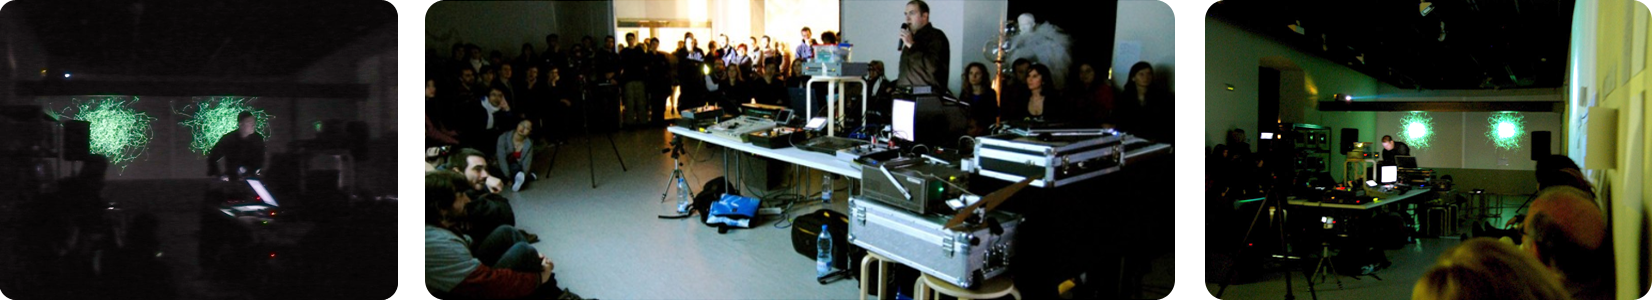 Lissajous Talk and Concert